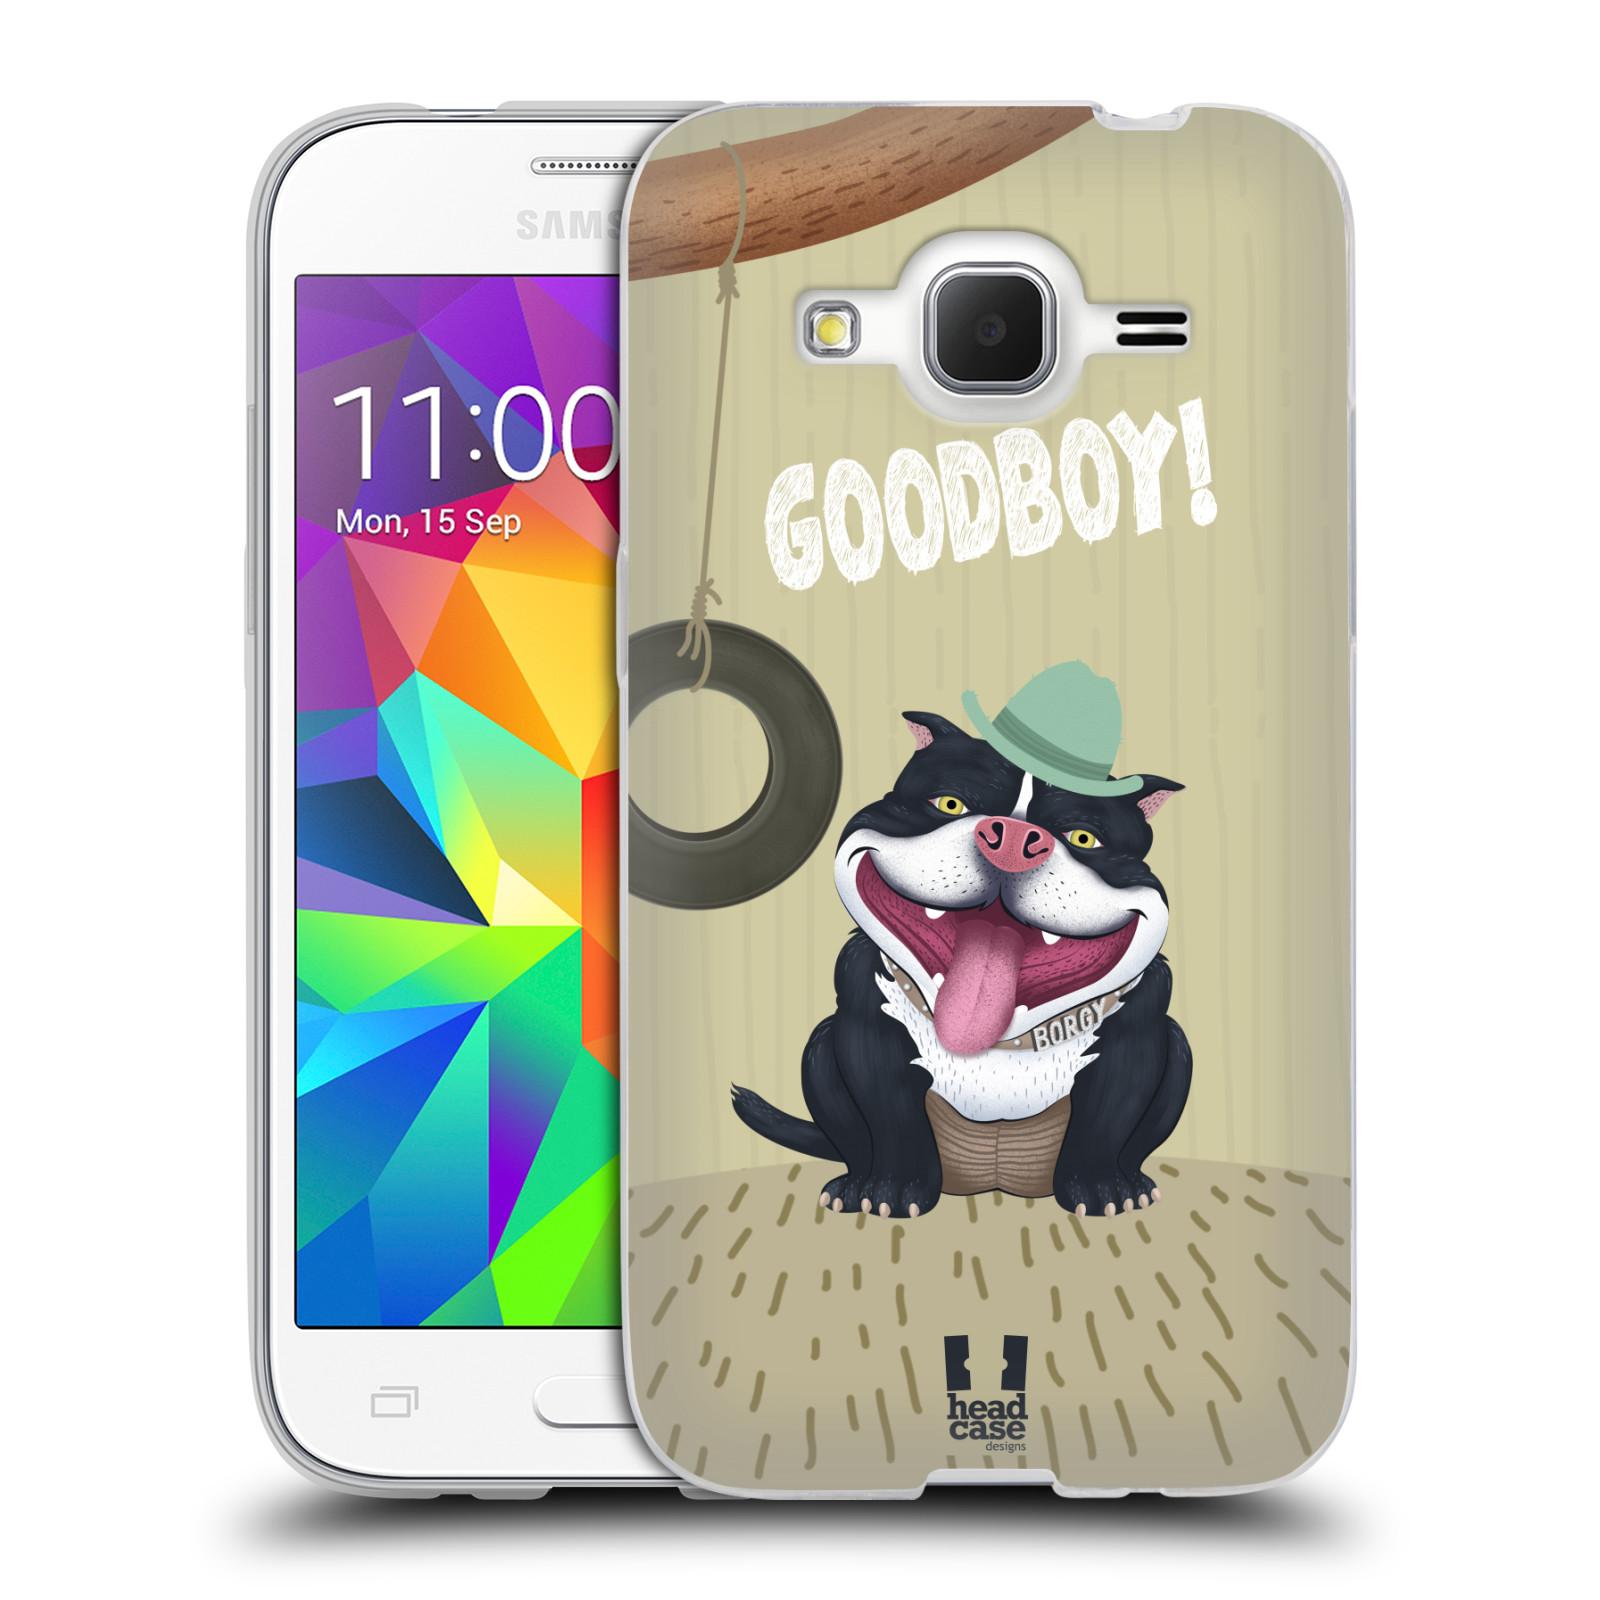 Silikonové pouzdro na mobil Samsung Galaxy Core Prime LTE HEAD CASE Goodboy! Pejsek (Silikonový kryt či obal na mobilní telefon Samsung Galaxy Core Prime LTE SM-G360)